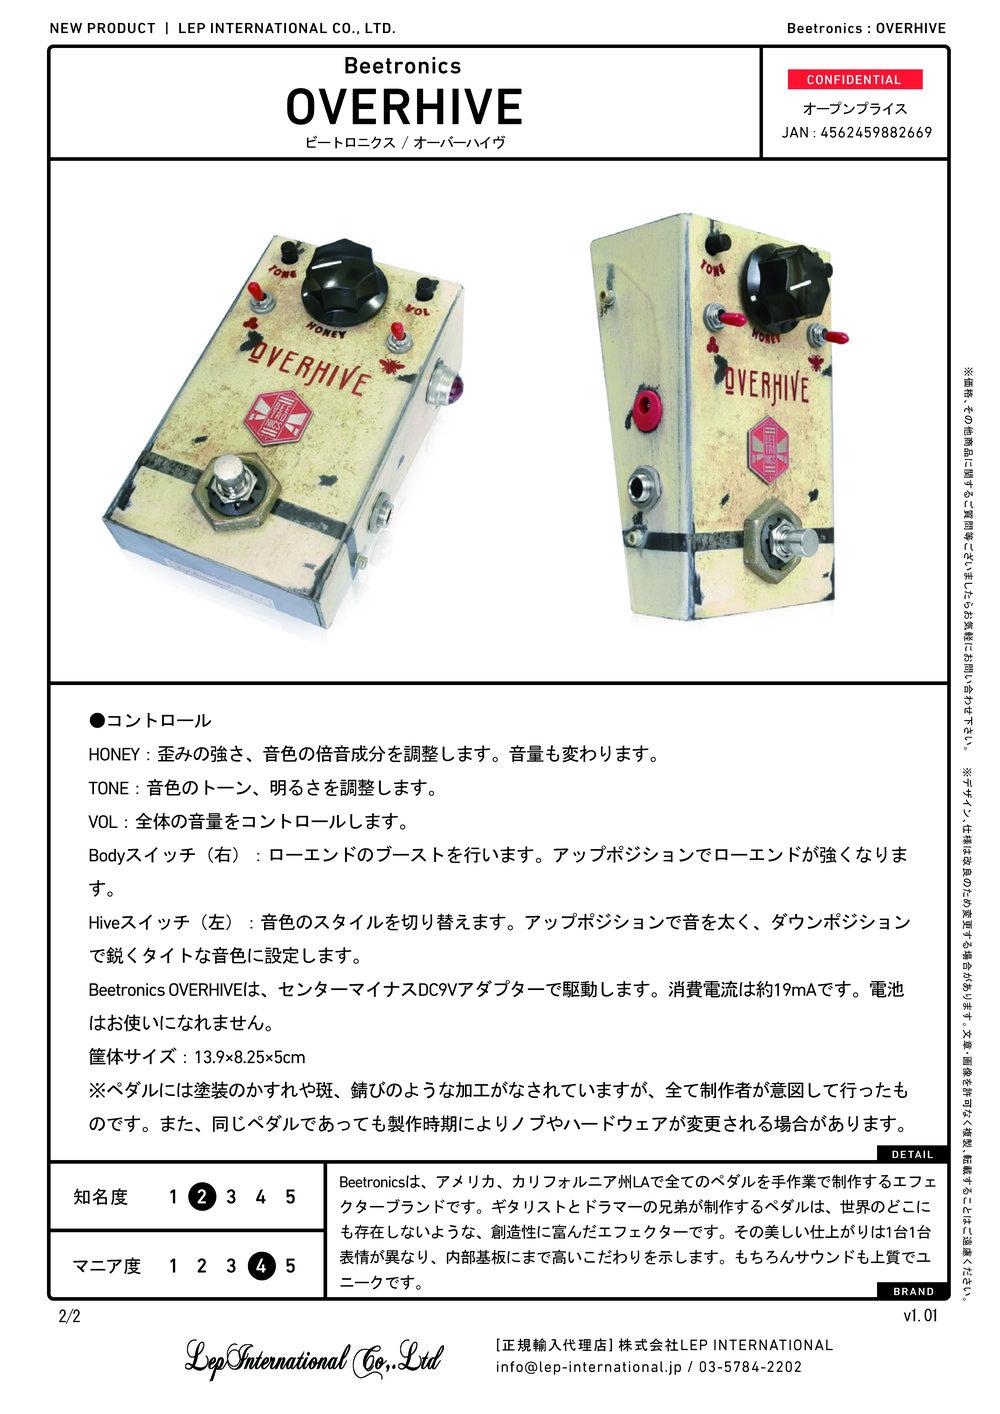 beetronics overhive v1.01_ページ_2.jpg